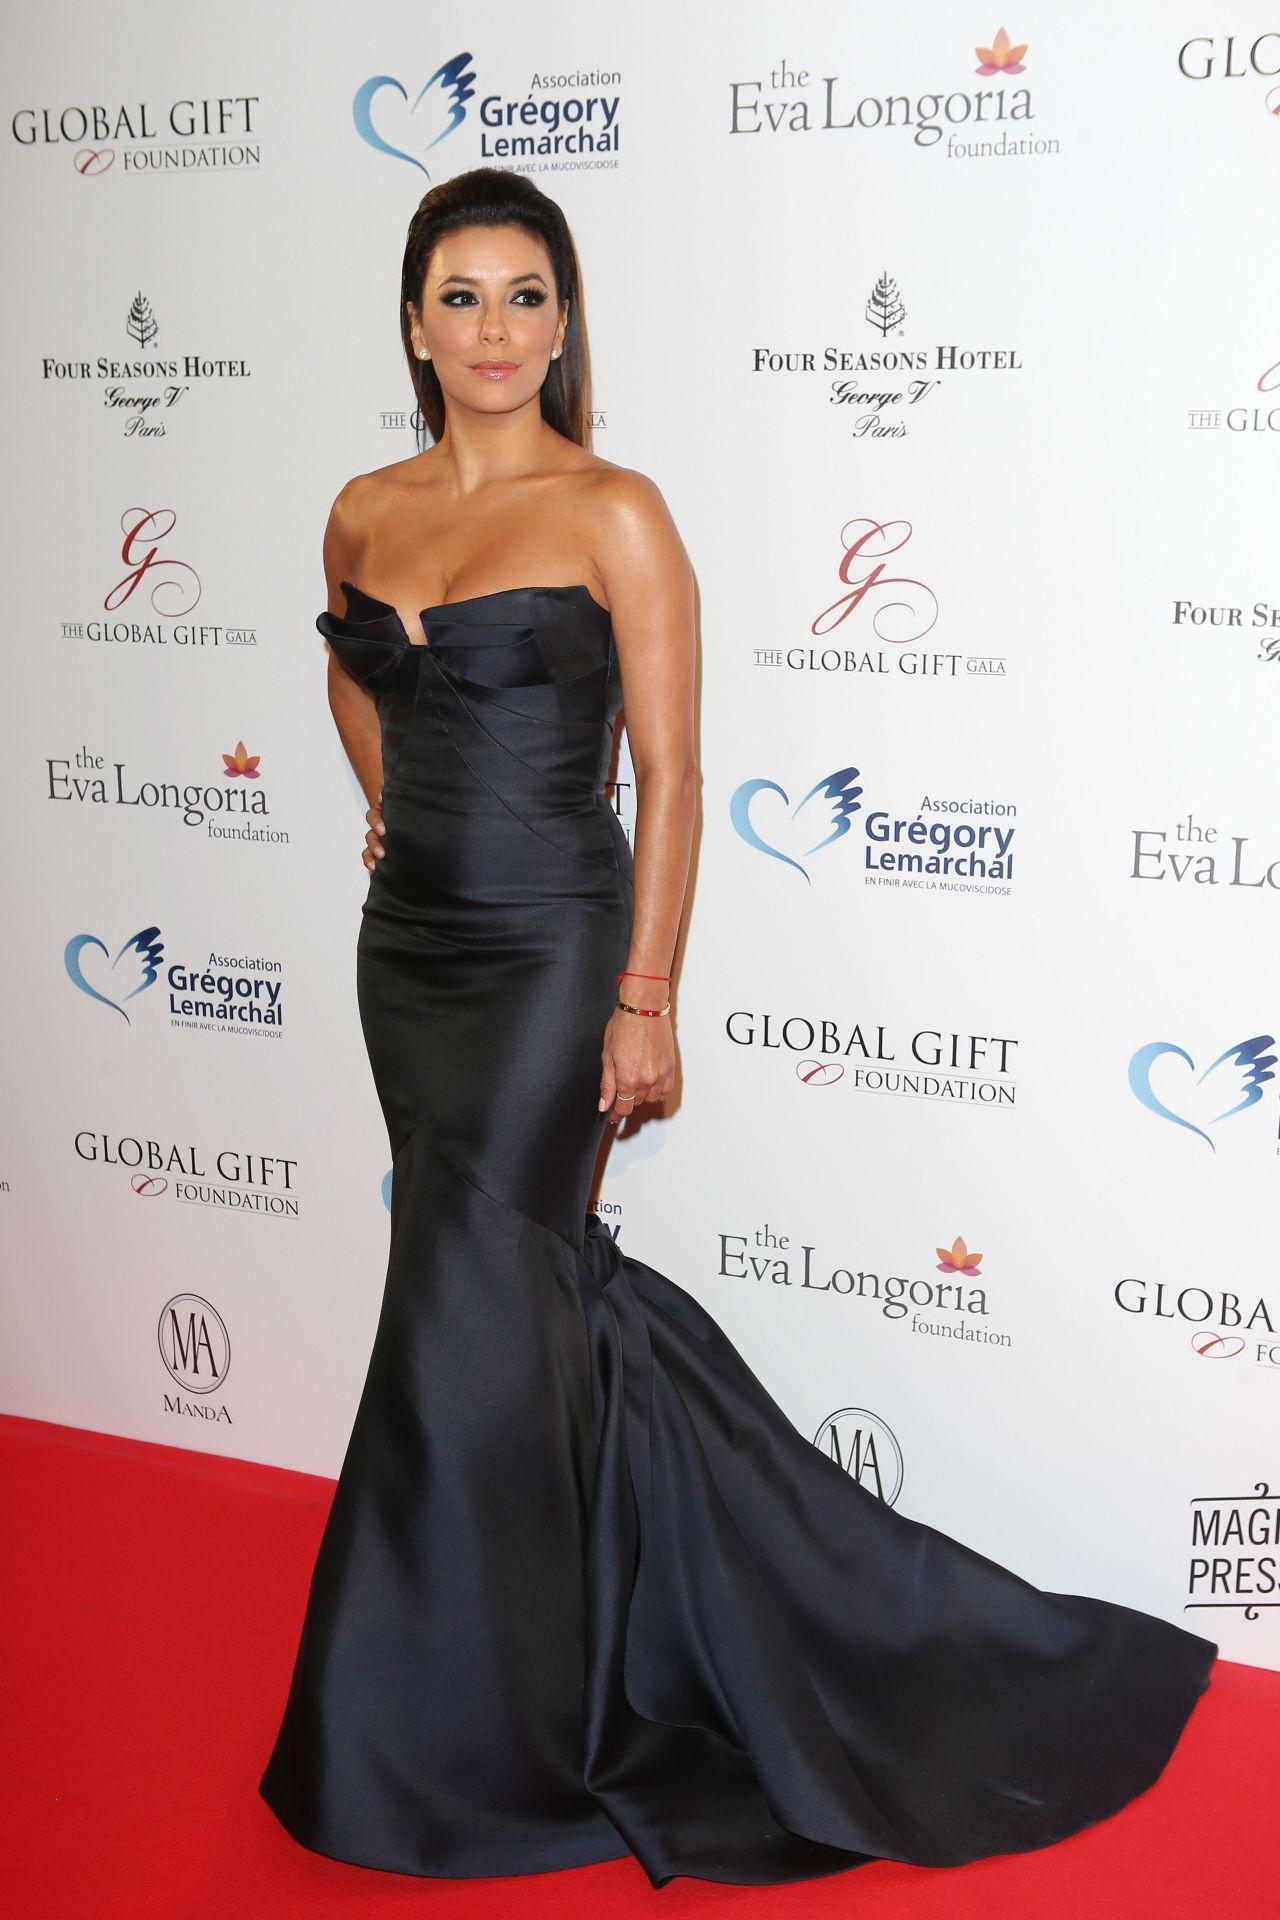 Eva Longoria in Monique Lhuillier Gown in Paris - 2014 Global Gift Gala